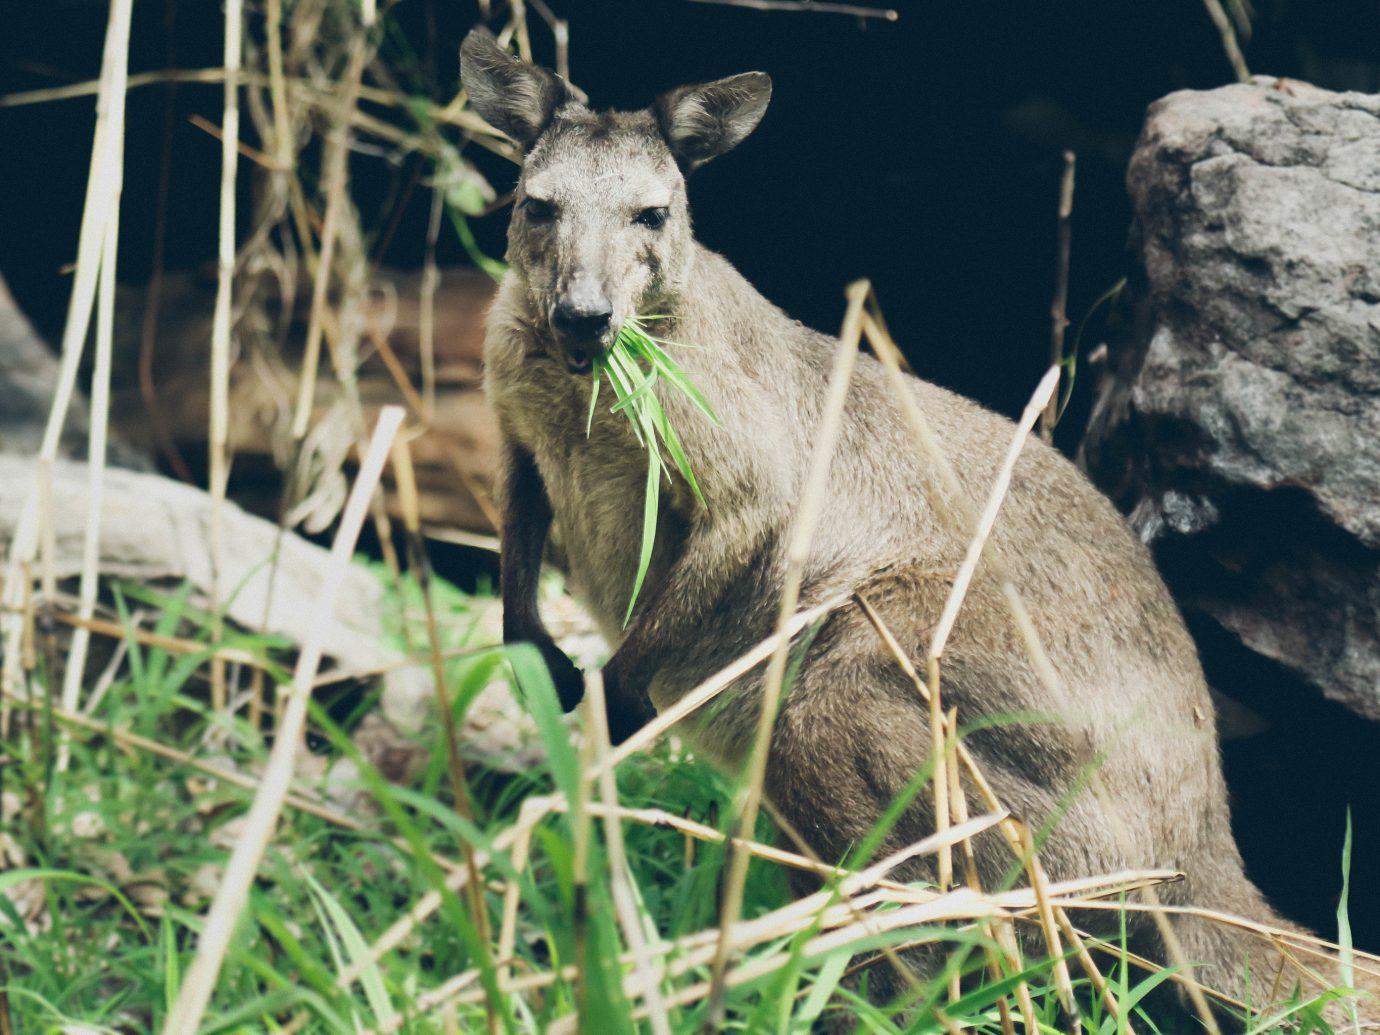 Trip Ideas animal outdoor mammal grass Nature Wildlife fauna kangaroo deer white tailed deer marsupial macropodidae zoo hillside